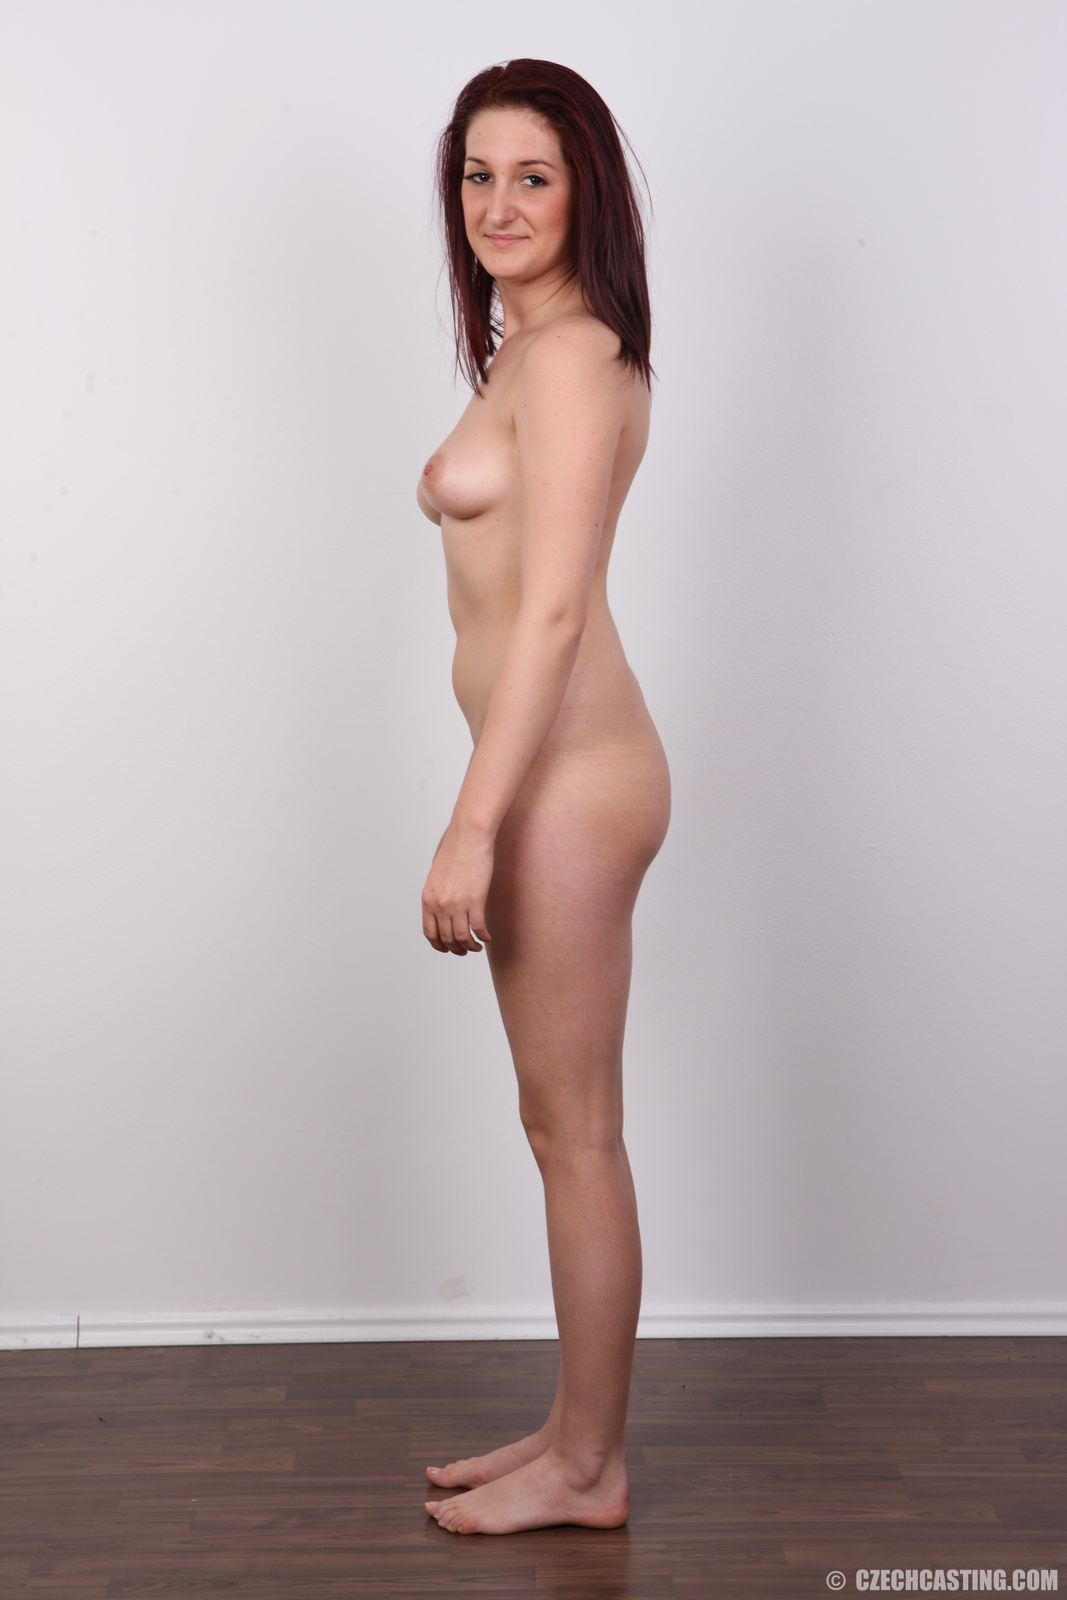 Elf milf hentai nude scene